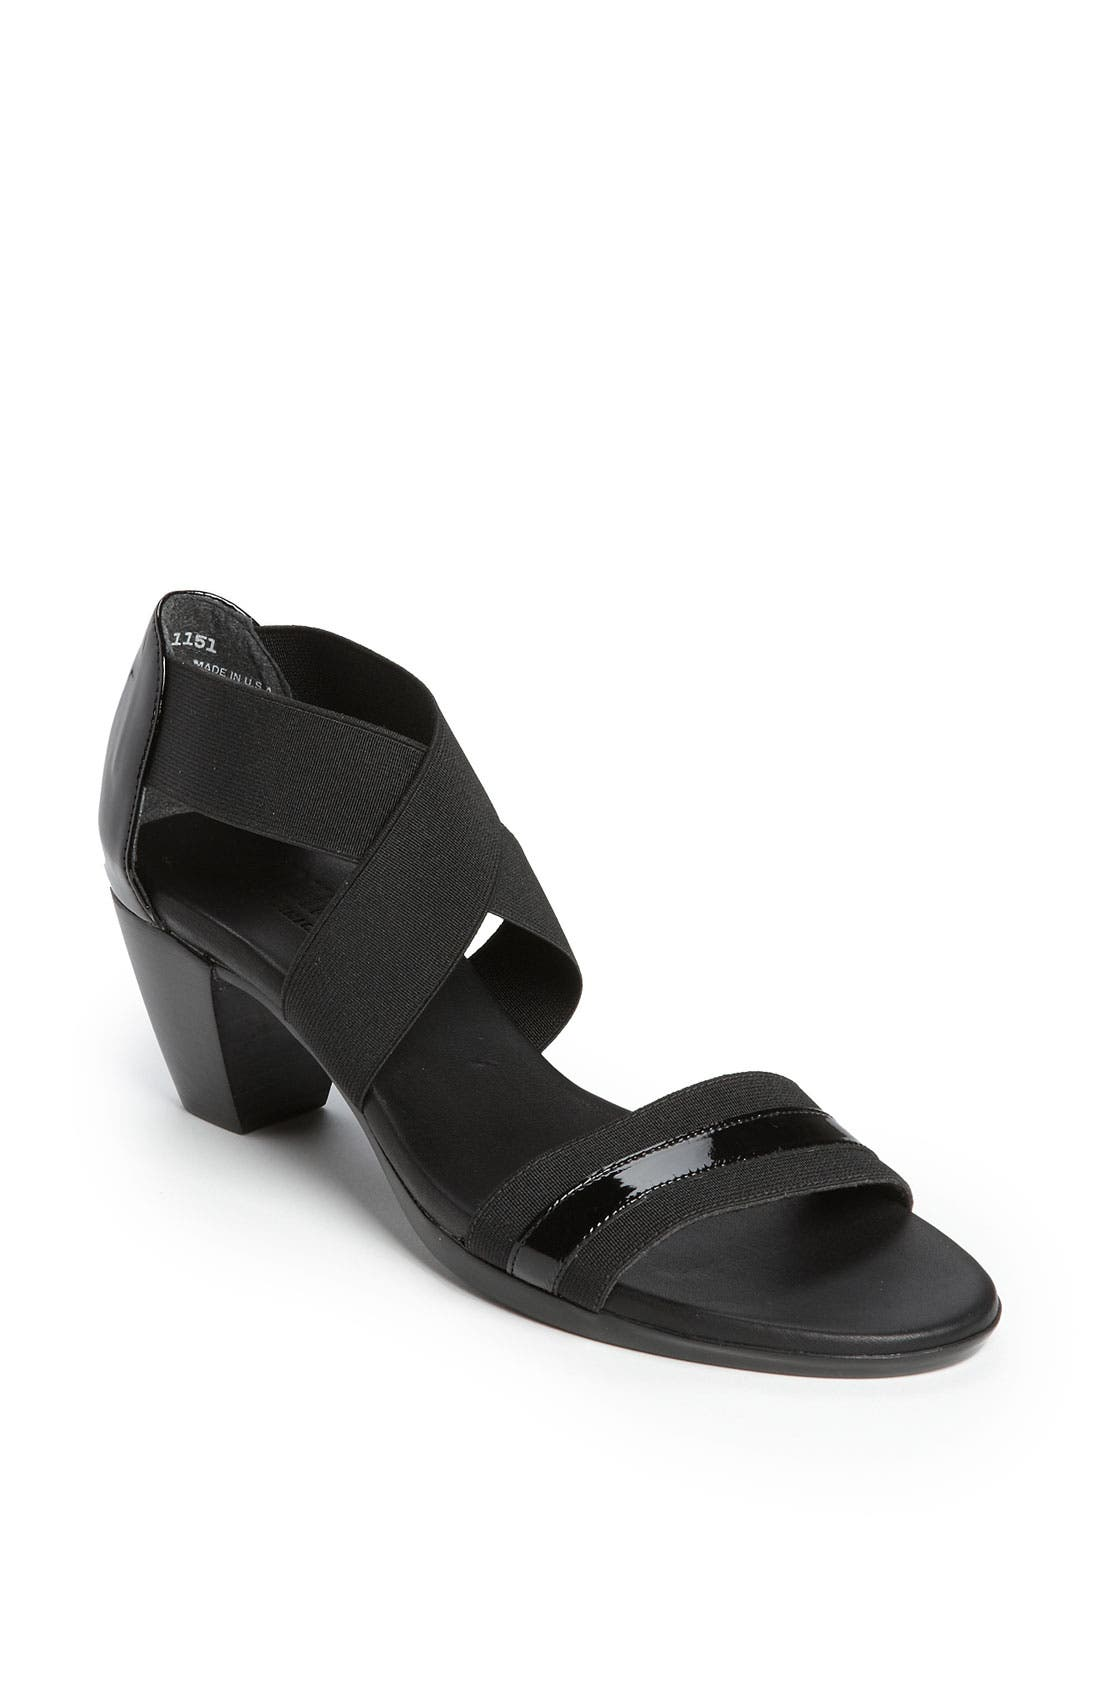 Alternate Image 1 Selected - Munro 'Delana' Sandal